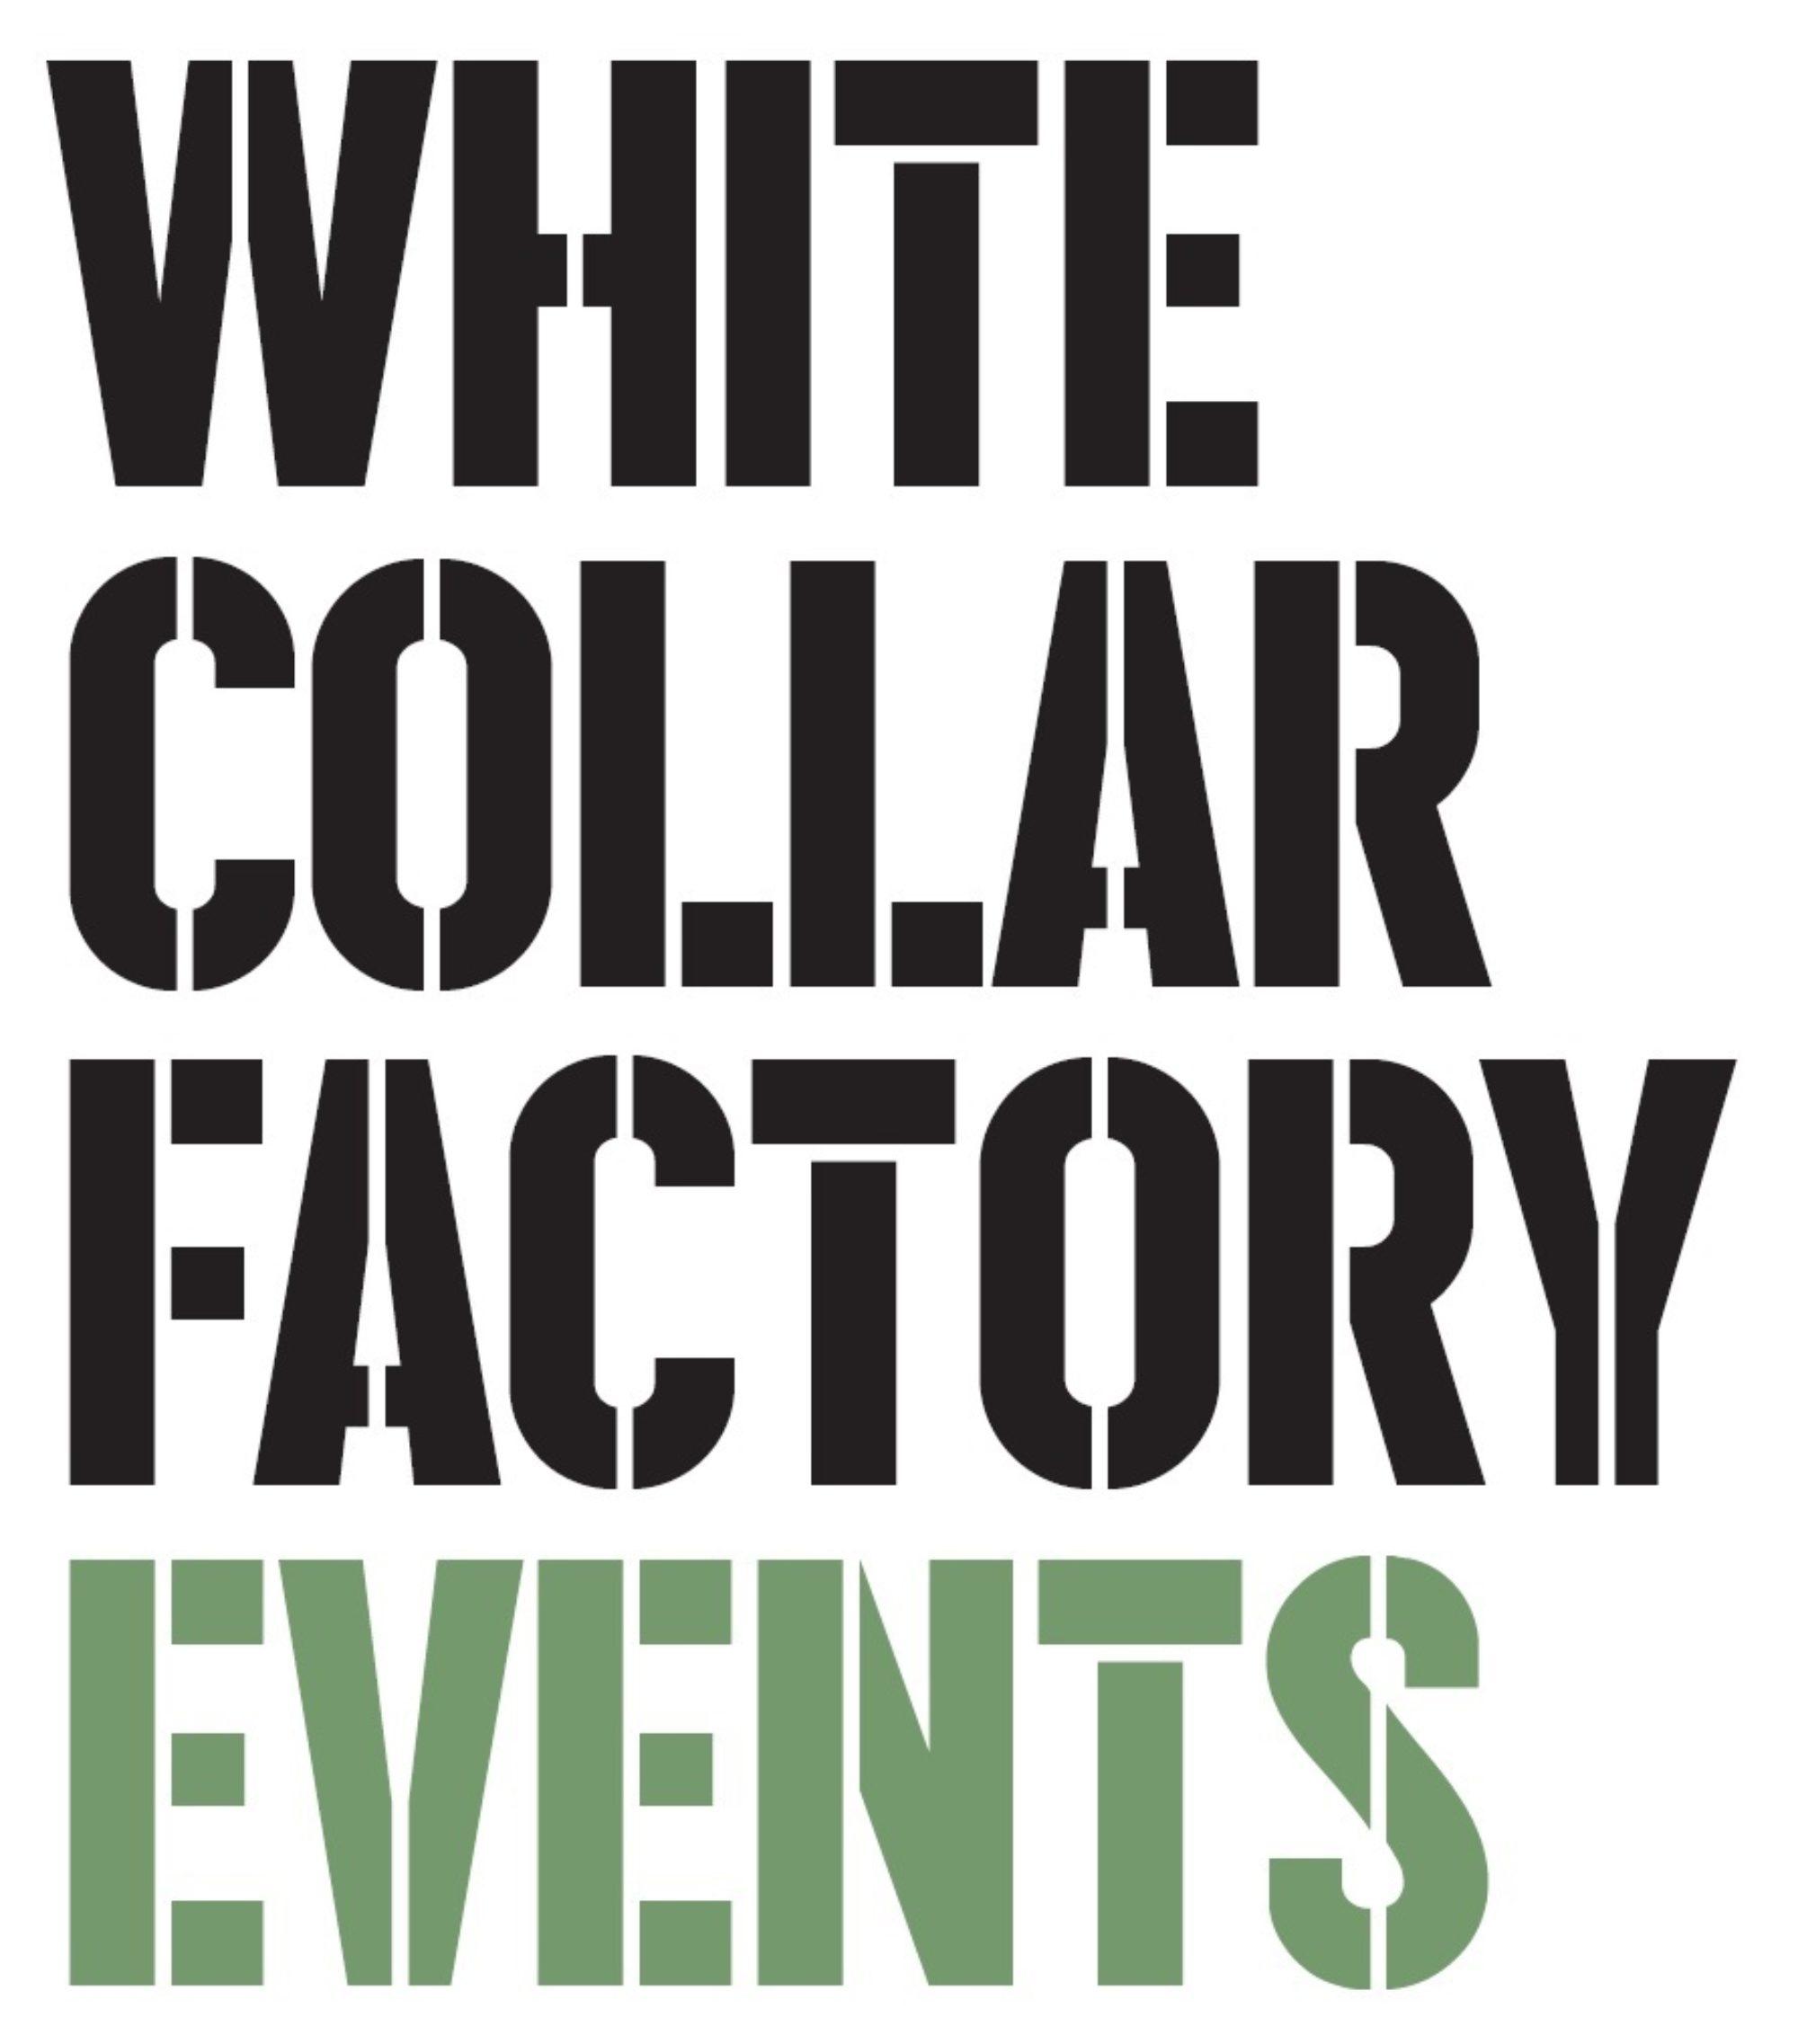 White Collar Factory Events starting September